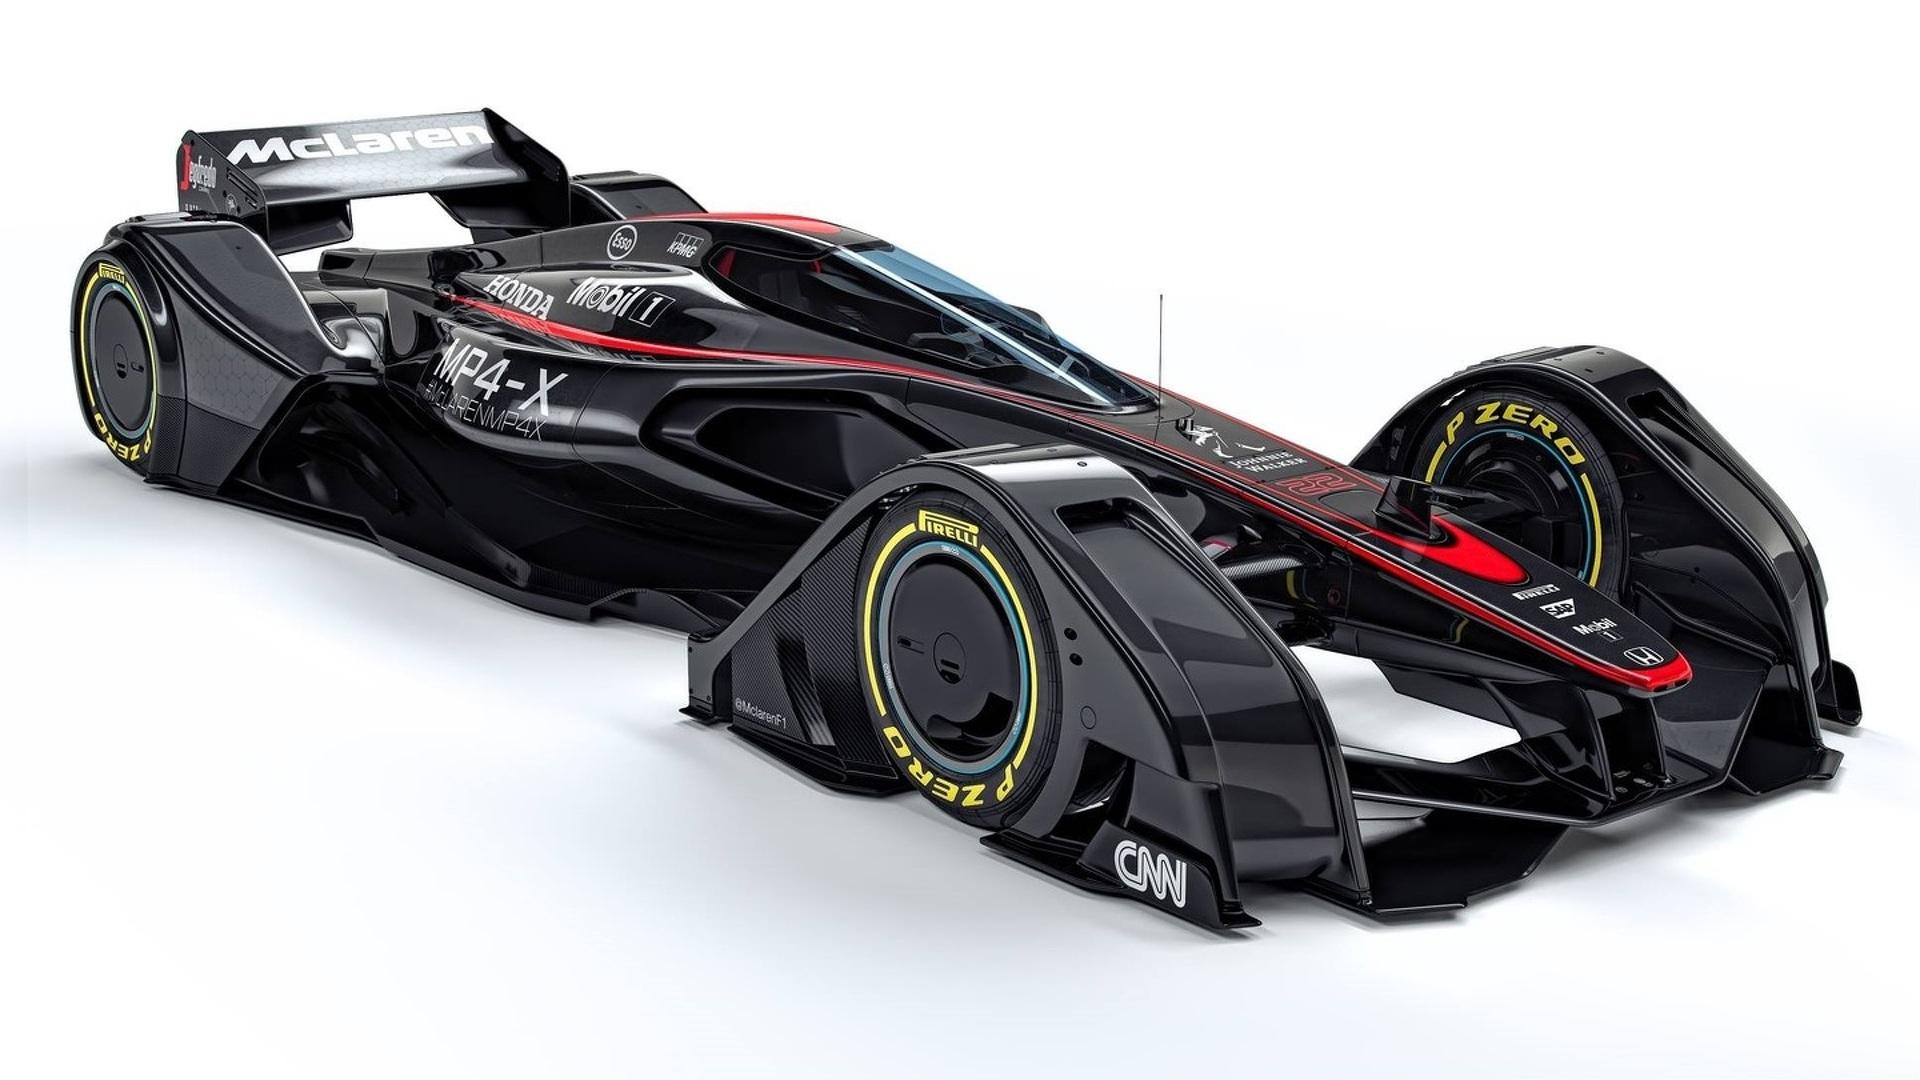 McLaren MP4-X concept previews the future of motorsport